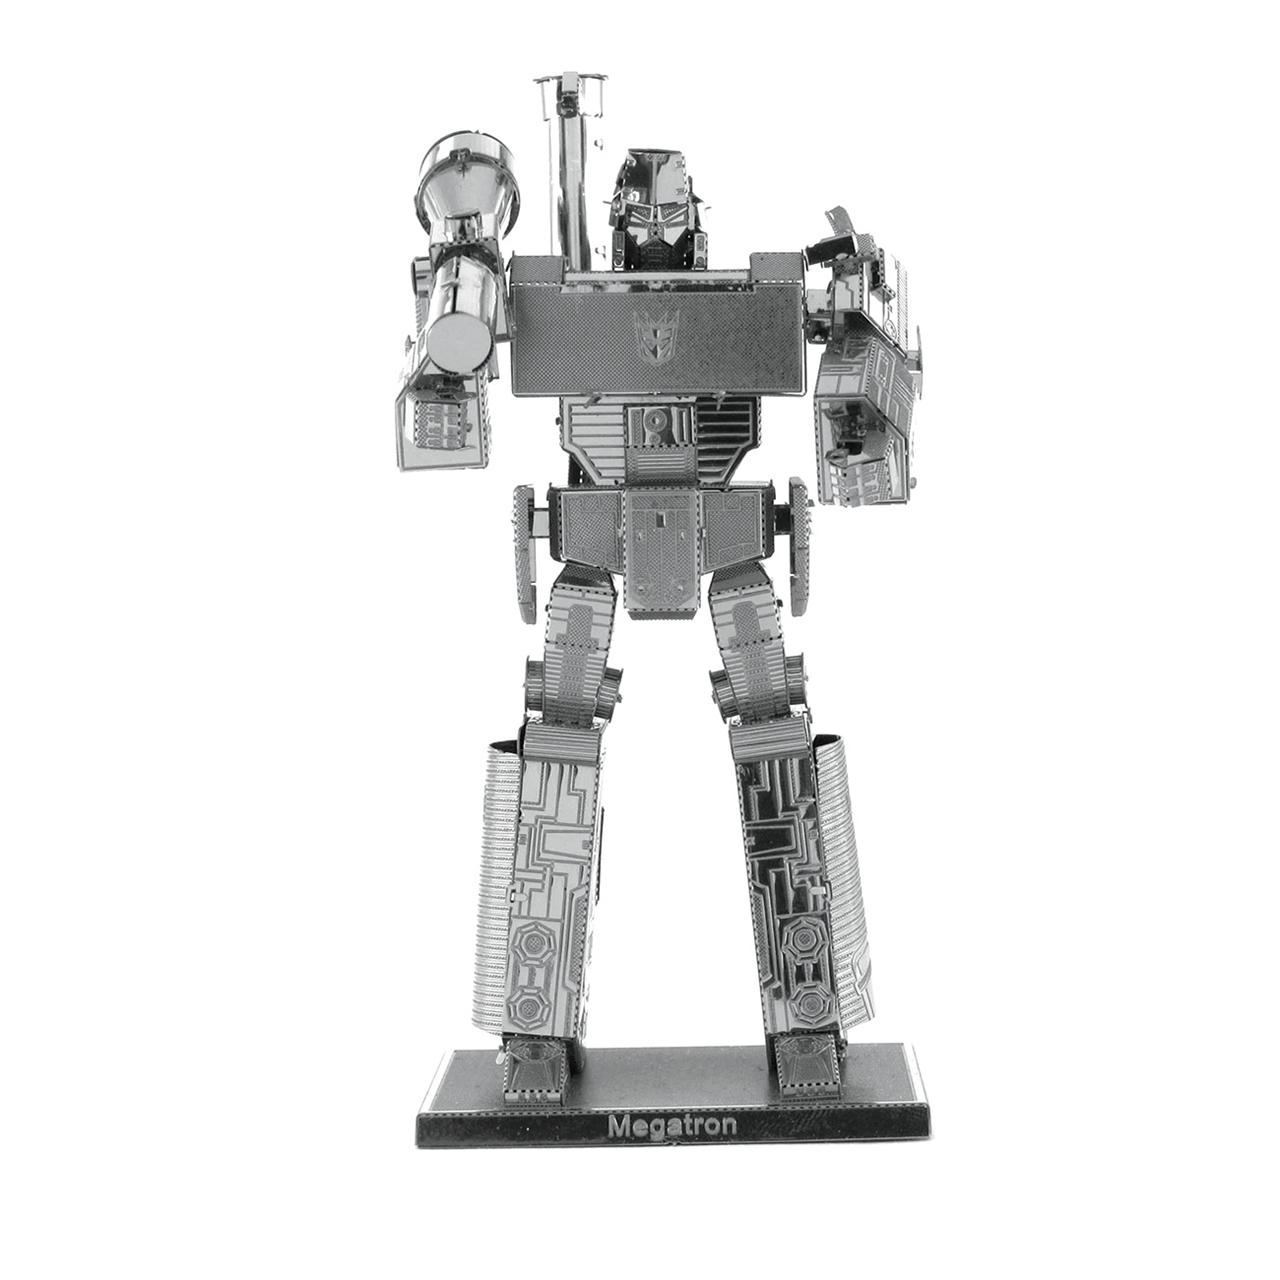 Fascinations Transformers Megatron 3D Metal Model Kit